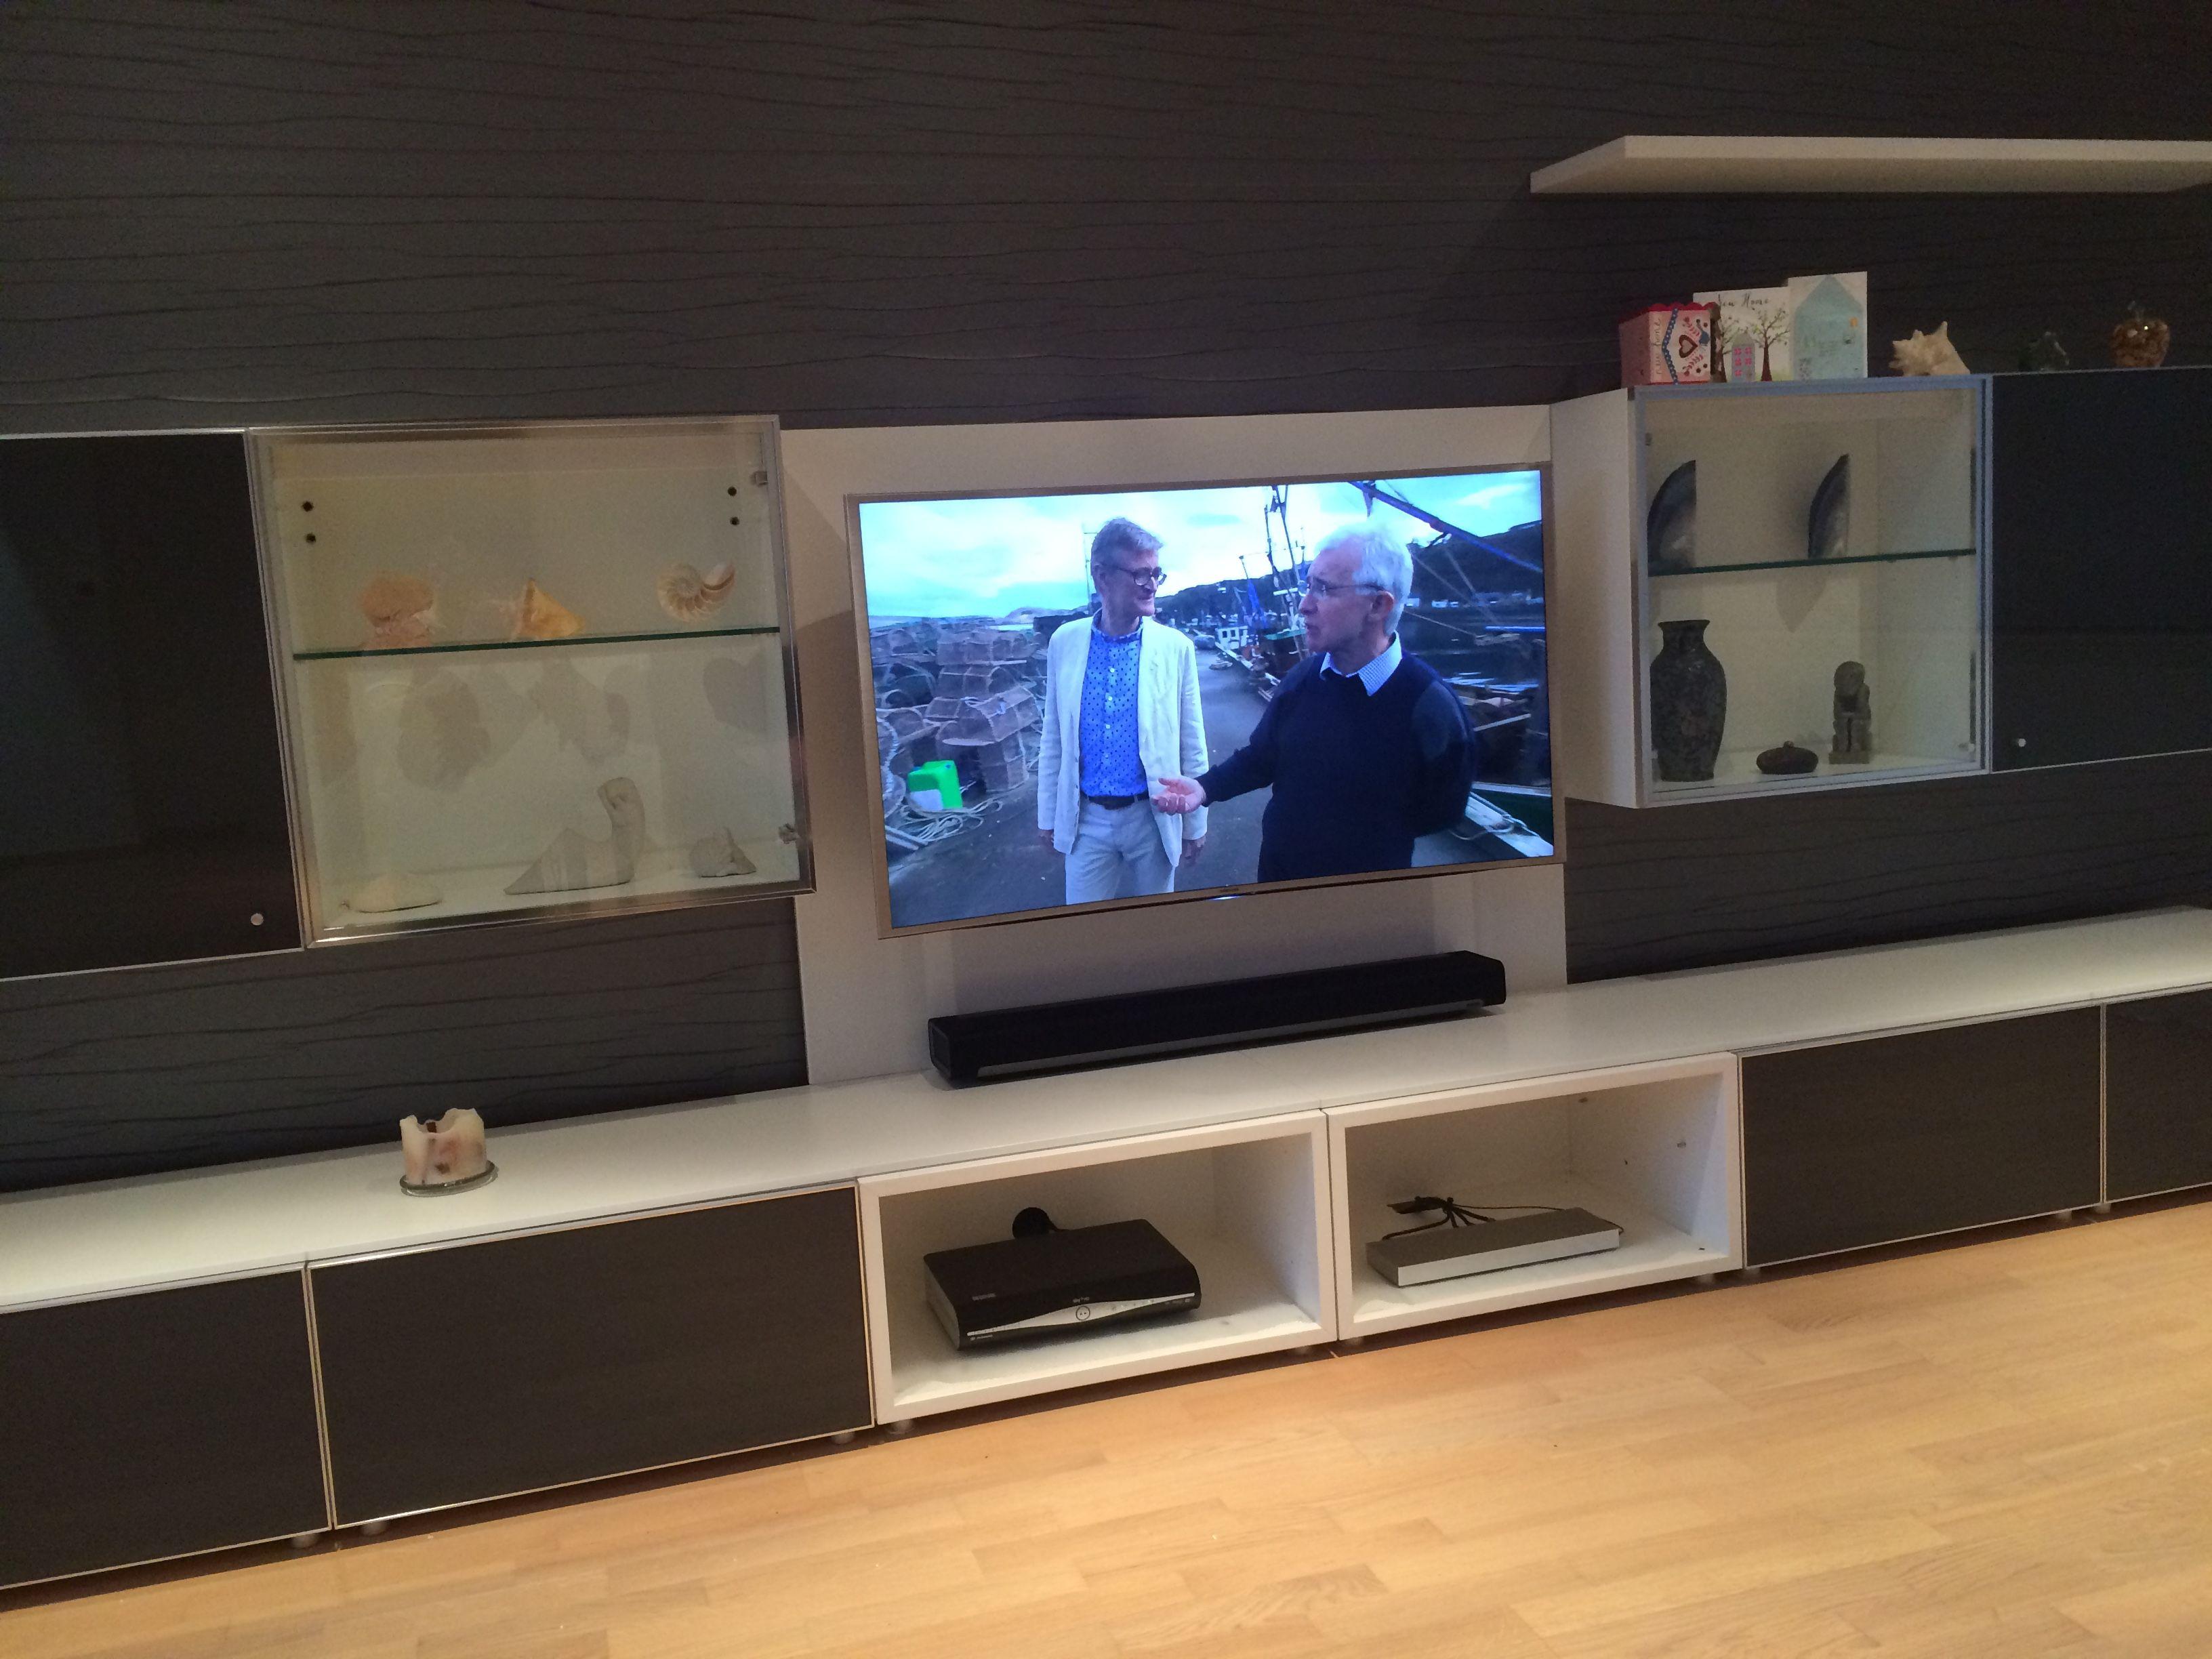 Samsung 4k Curve TV installation with Sonos Playbar, Anthony